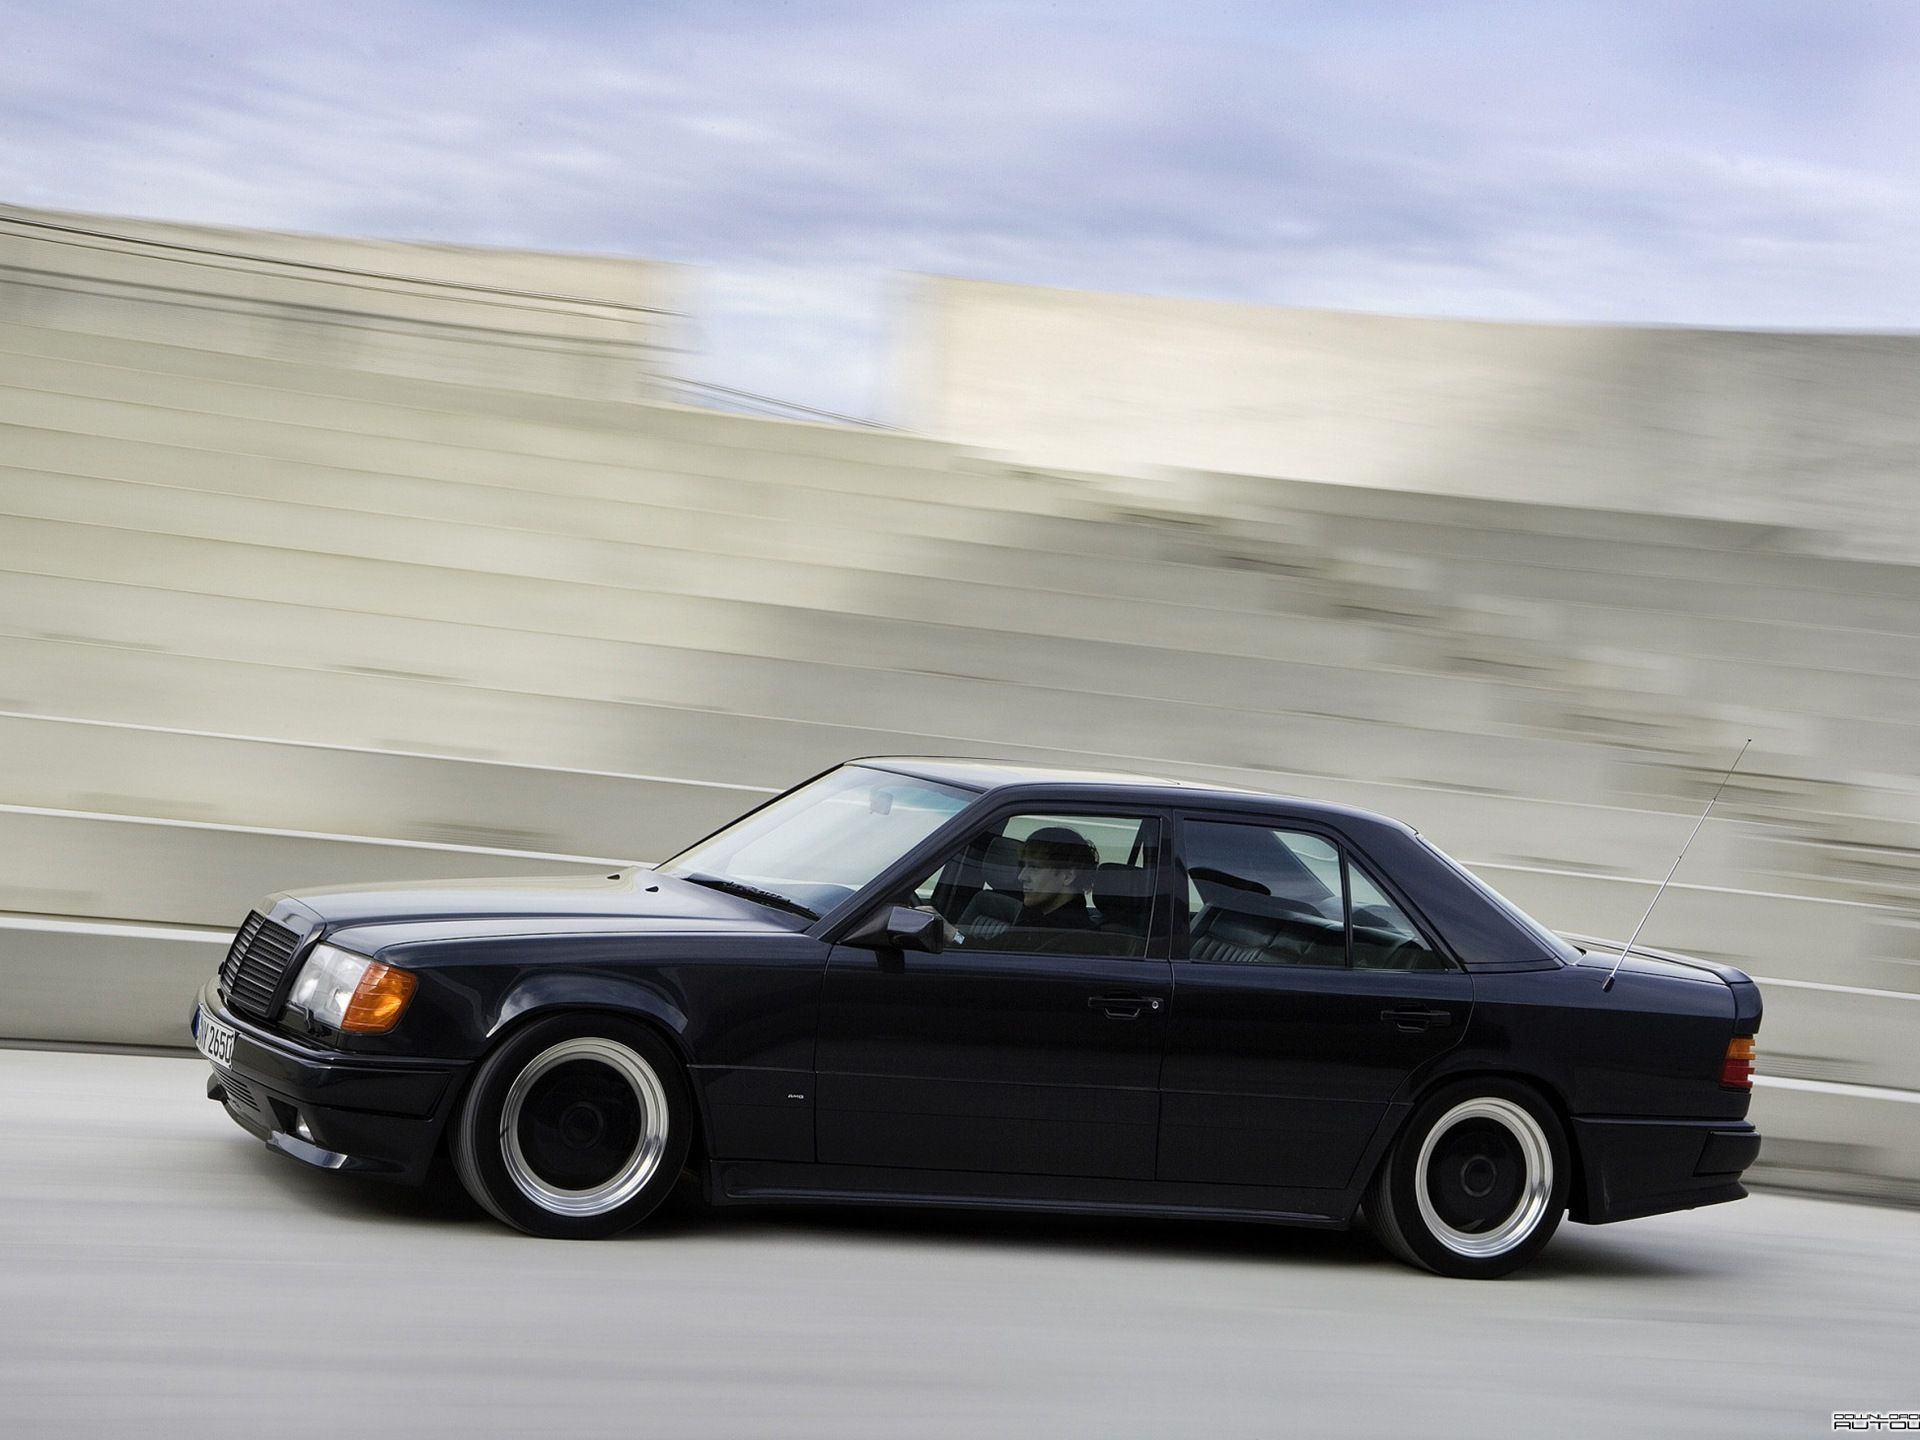 W124 Amg Hammer 6 0 Mercedes Benz Amg Mercedes W124 Mercedes